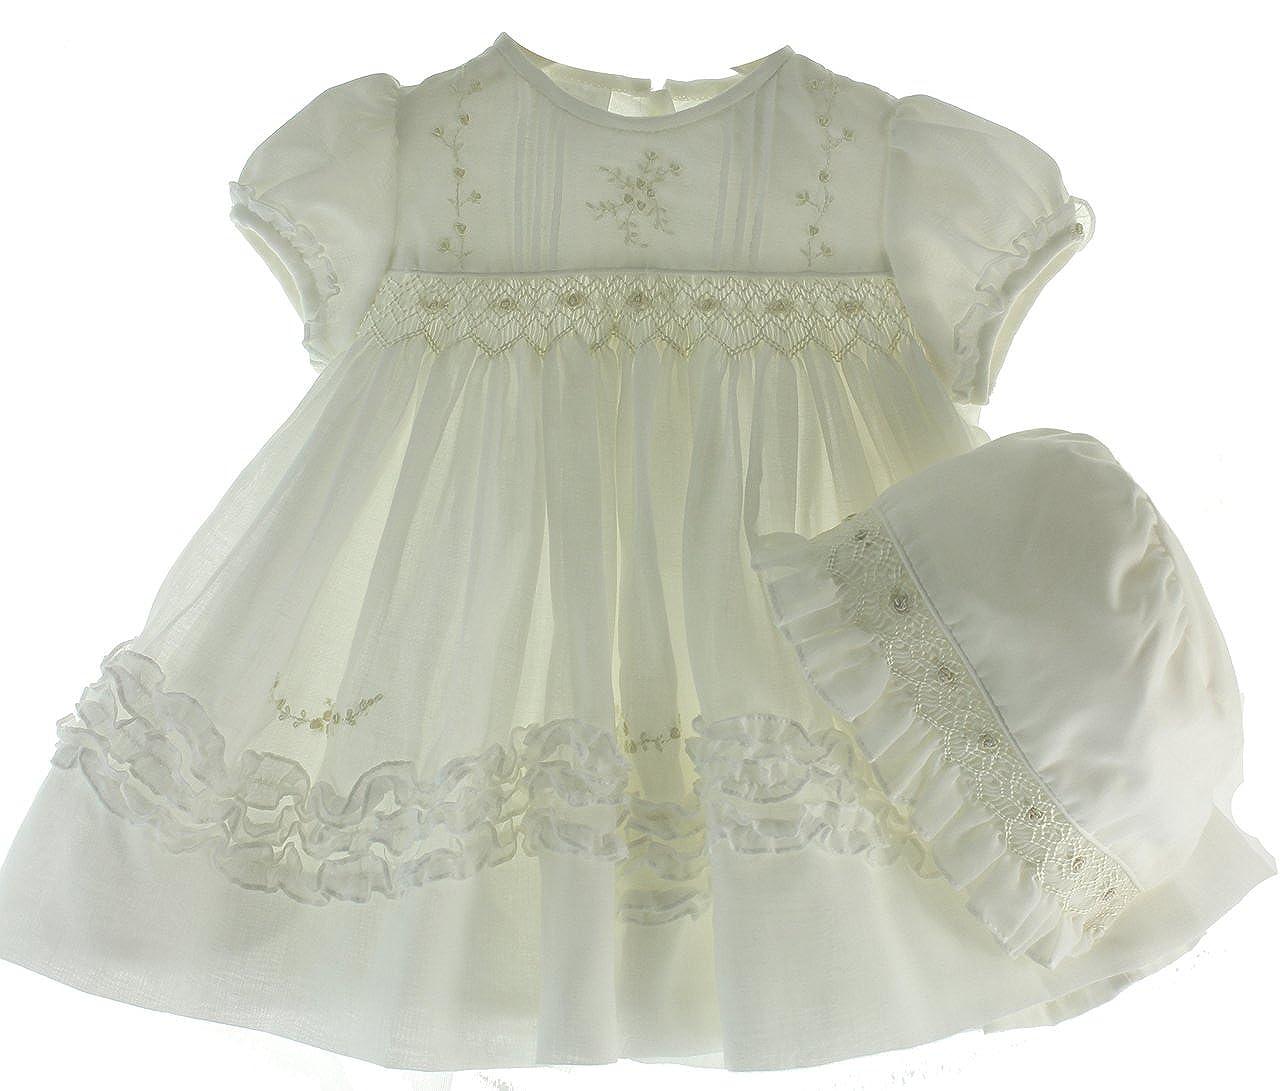 f0952f1d4c4e Amazon.com: Girls Ivory Heirloom Christening Dress & Bonnet Set Sarah  Louise Baby Clothes: Clothing